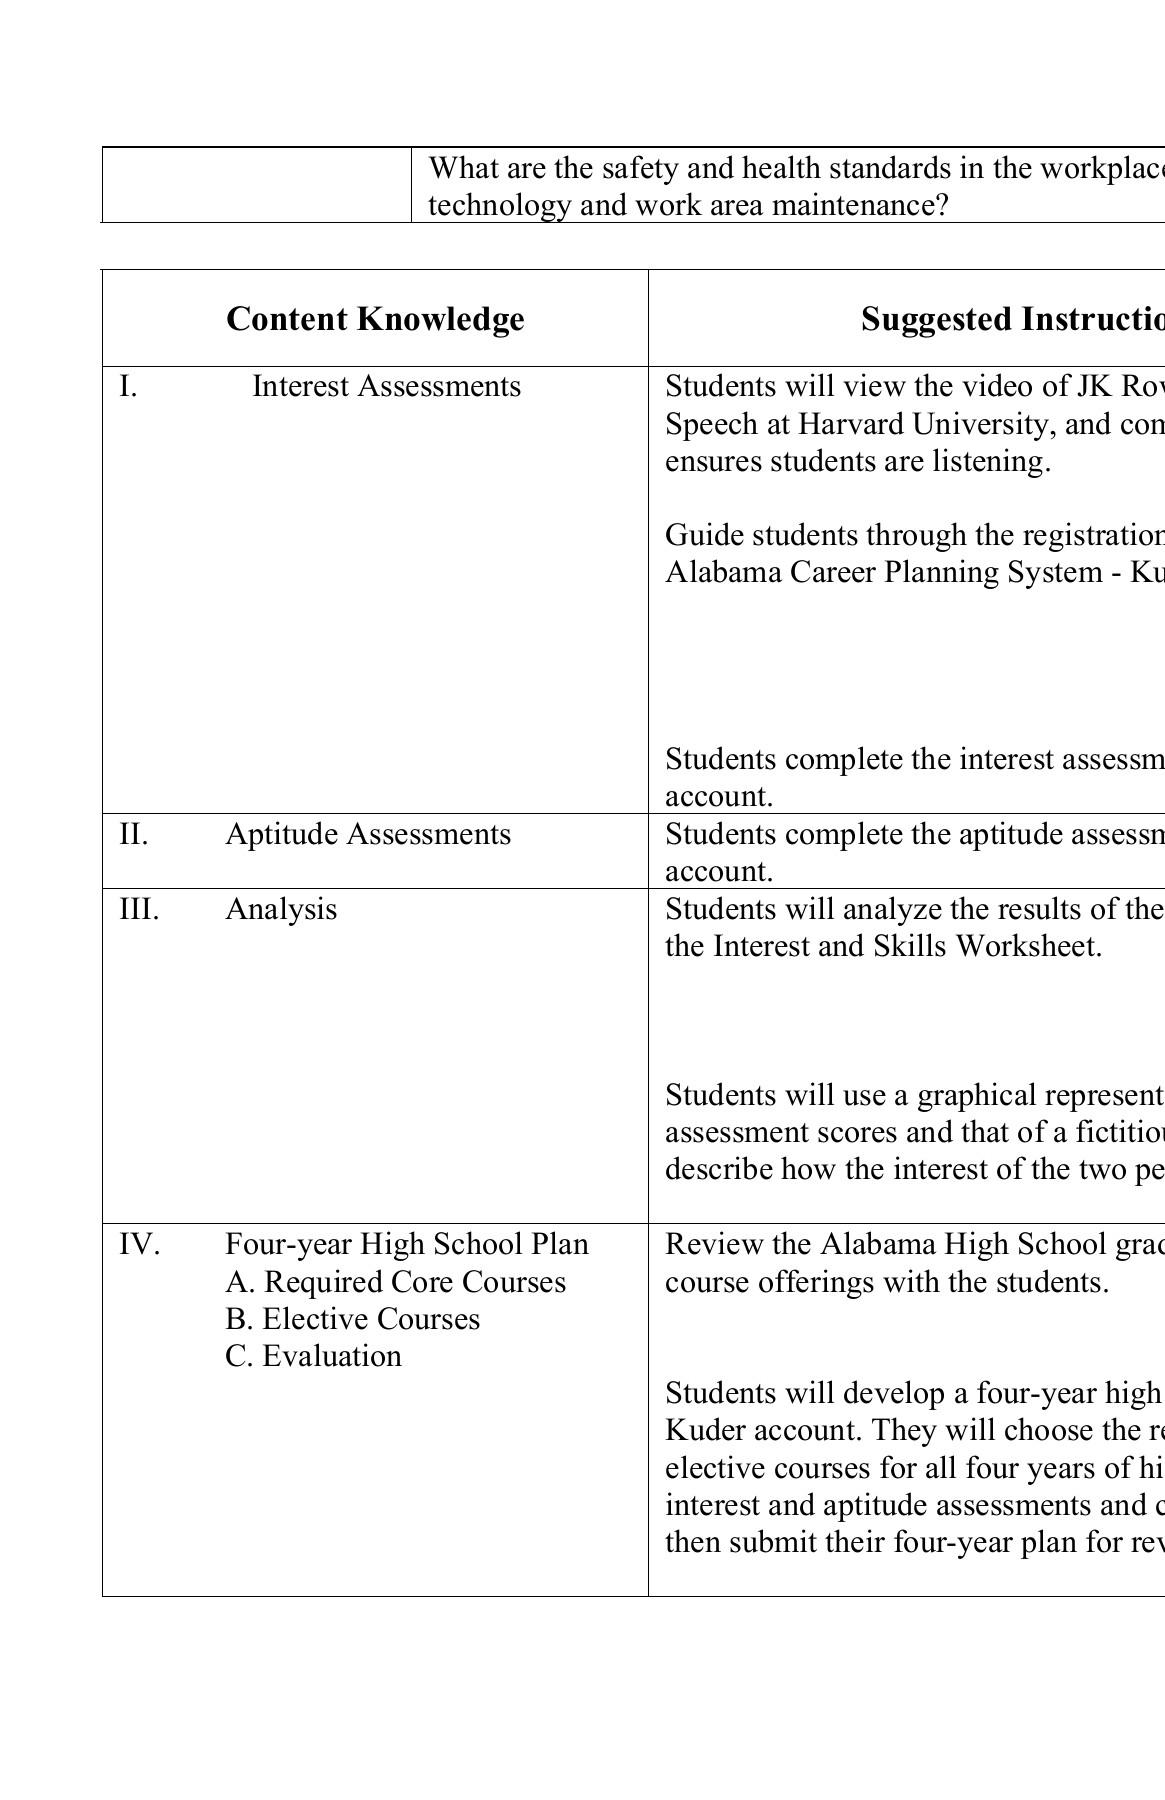 Career Planning For High School Students Worksheet